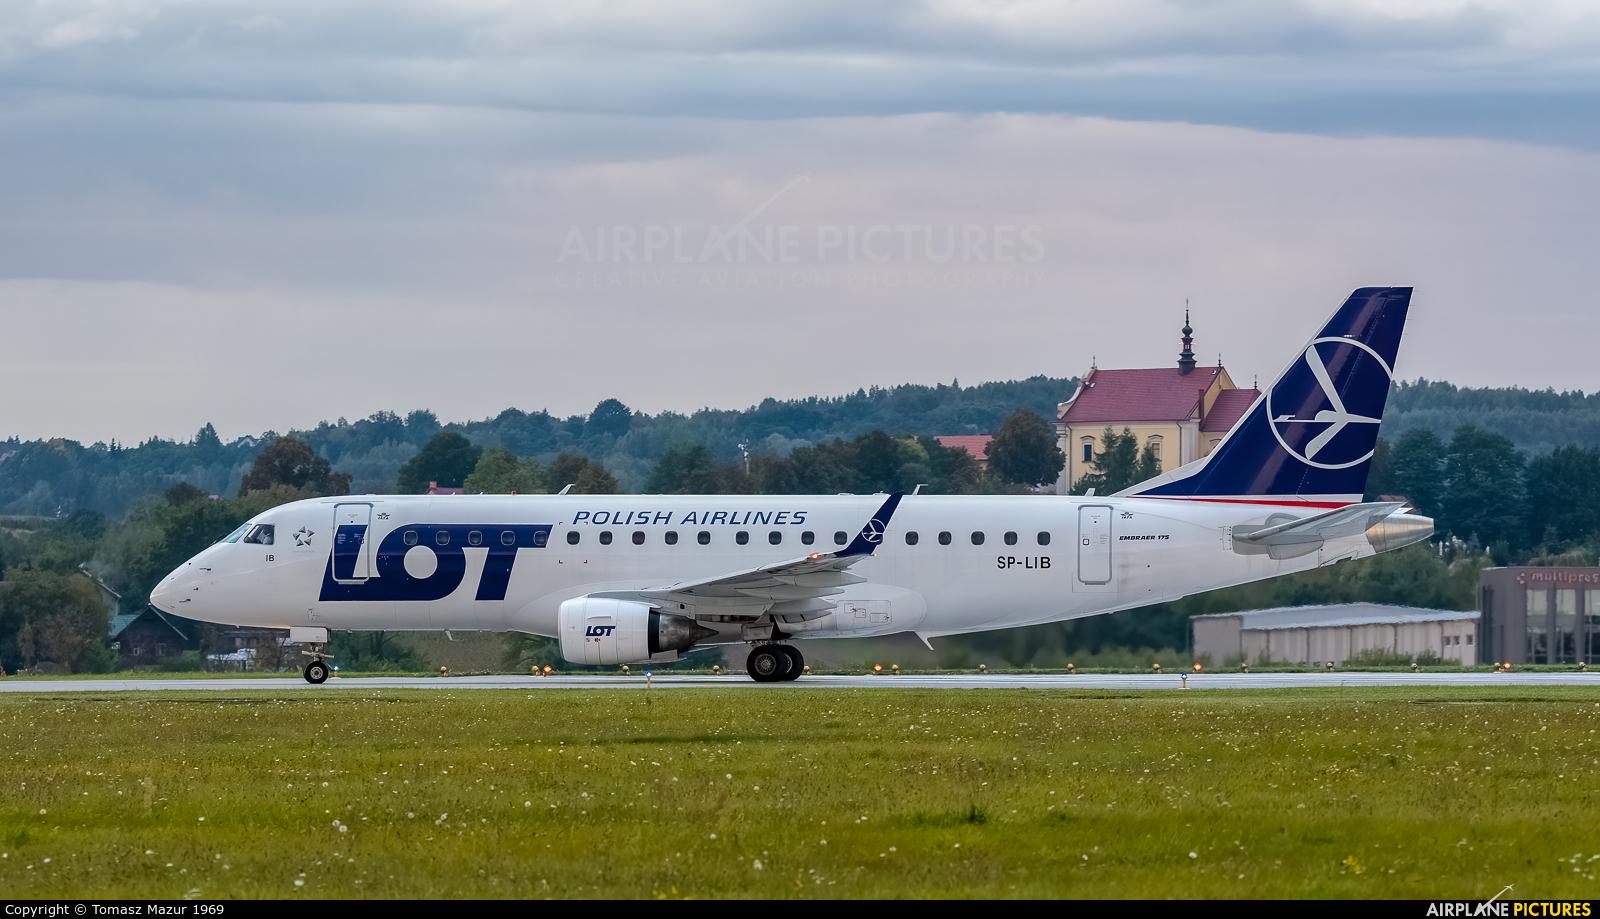 LOT - Polish Airlines SP-LIB aircraft at Kraków - John Paul II Intl